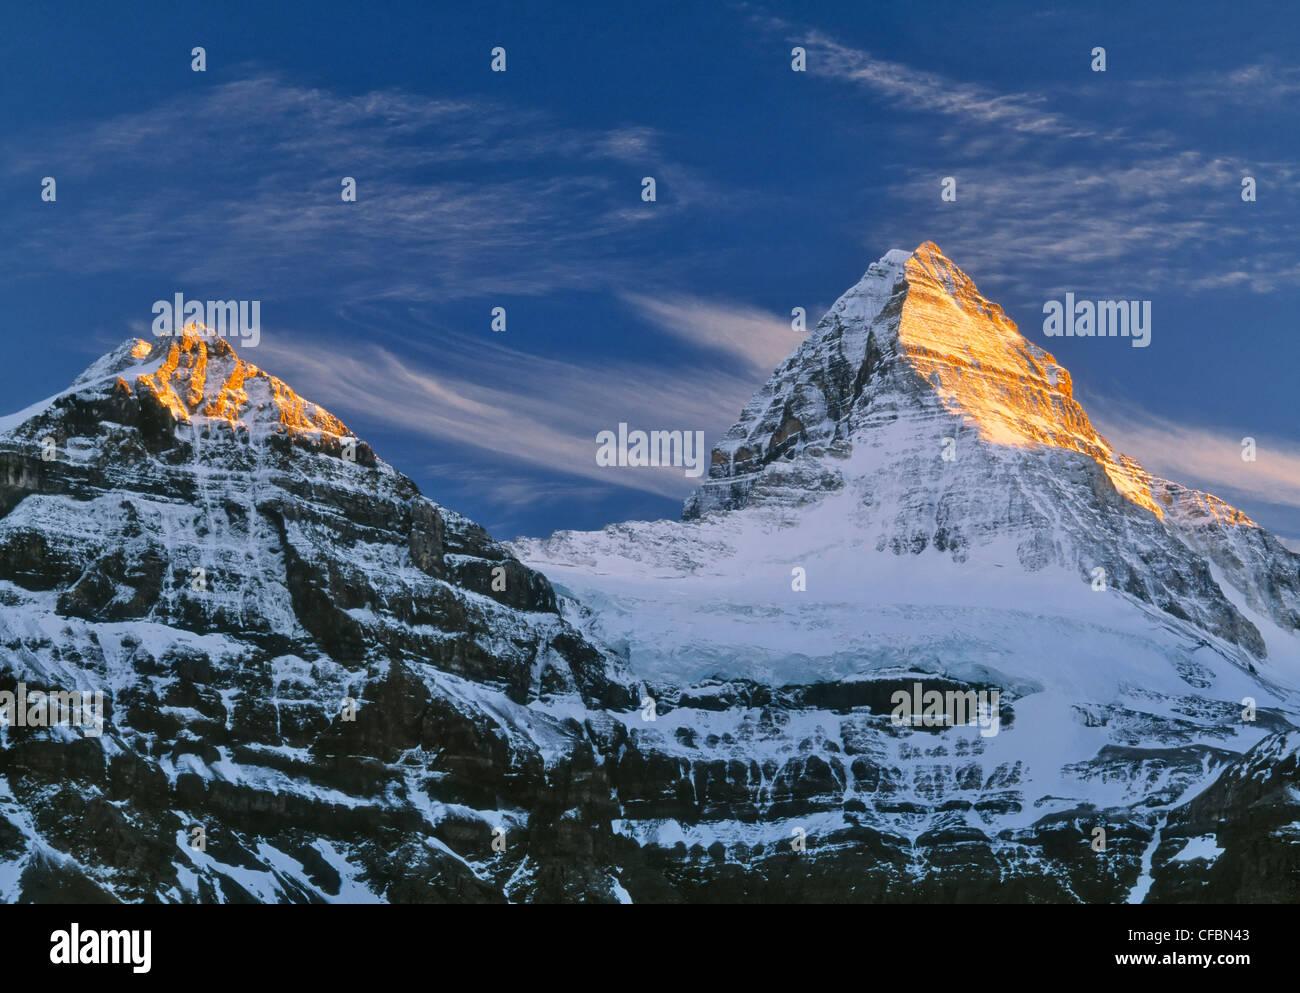 Mount Assiniboine, Mount Assiniboine Provincial Park, British Columbia, Canada Stock Photo